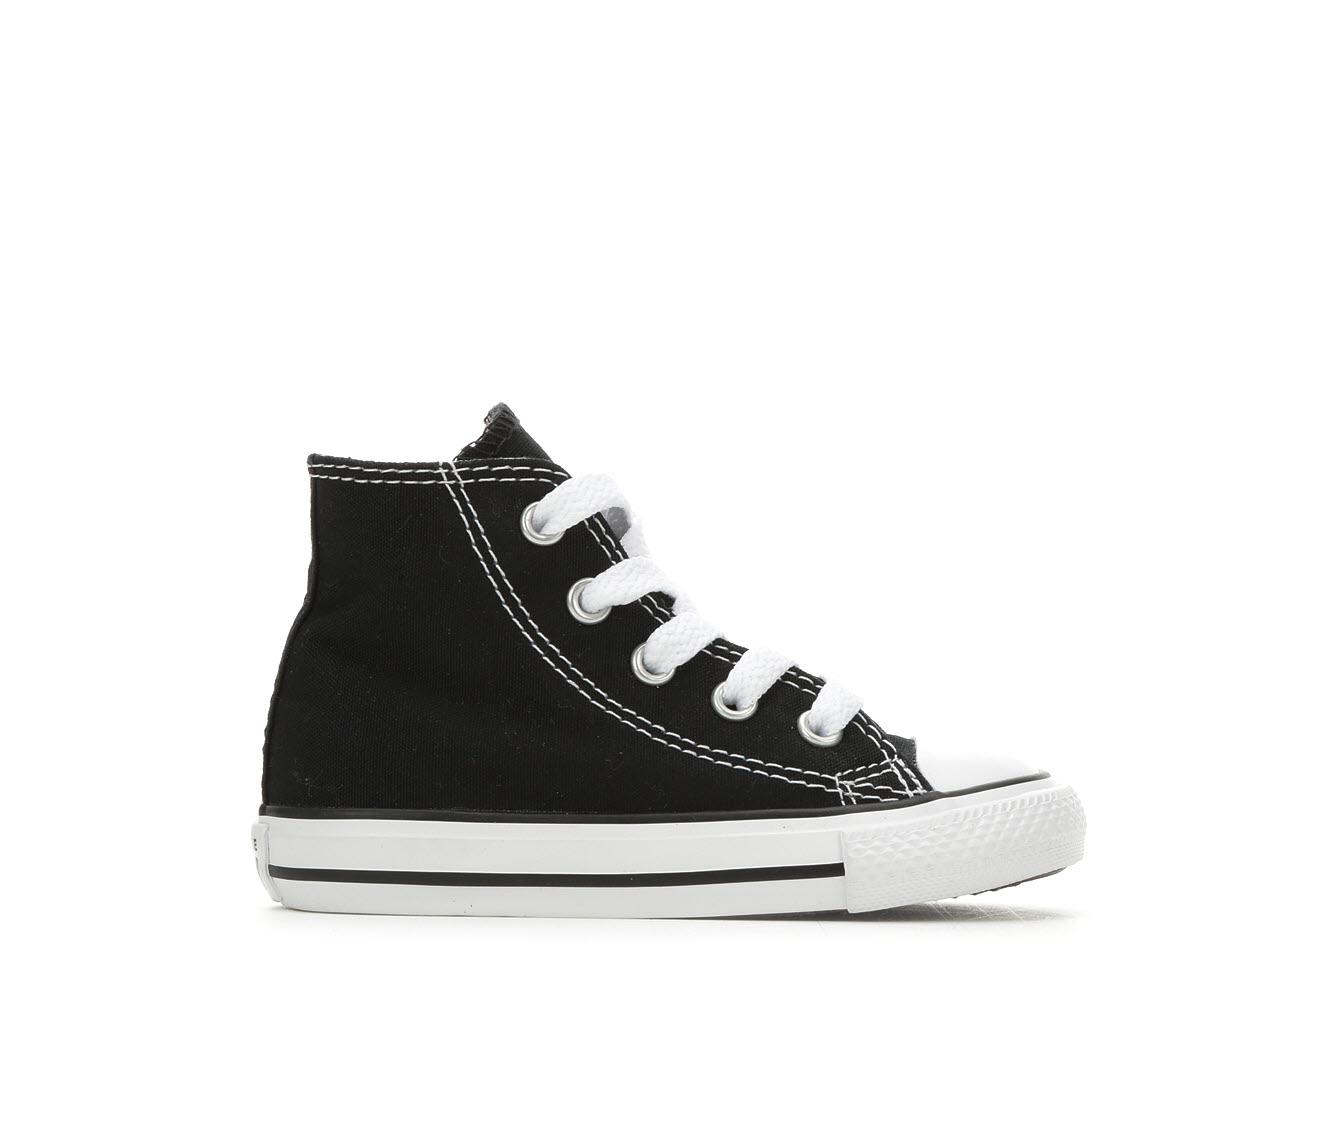 Boys' Converse Infant Chuck Taylor All Star Canvas Hi Sneakers (Black)